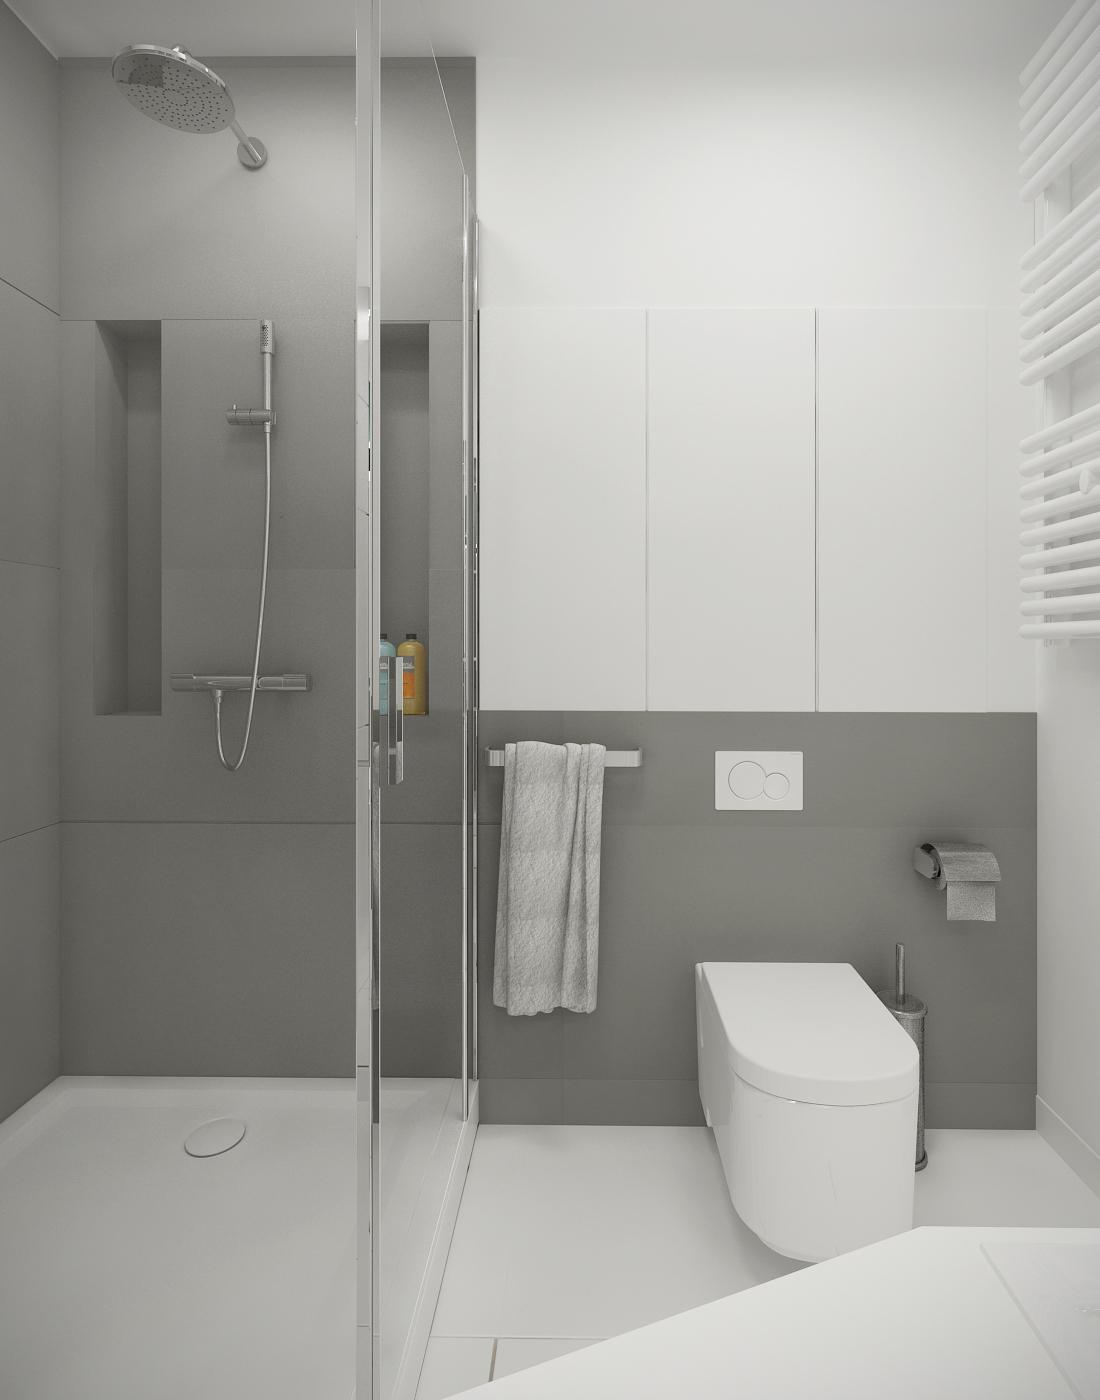 A Suitable Simple Small Bathroom Designs Looks So Perfect ... on Simple Small Bathroom Ideas  id=47301